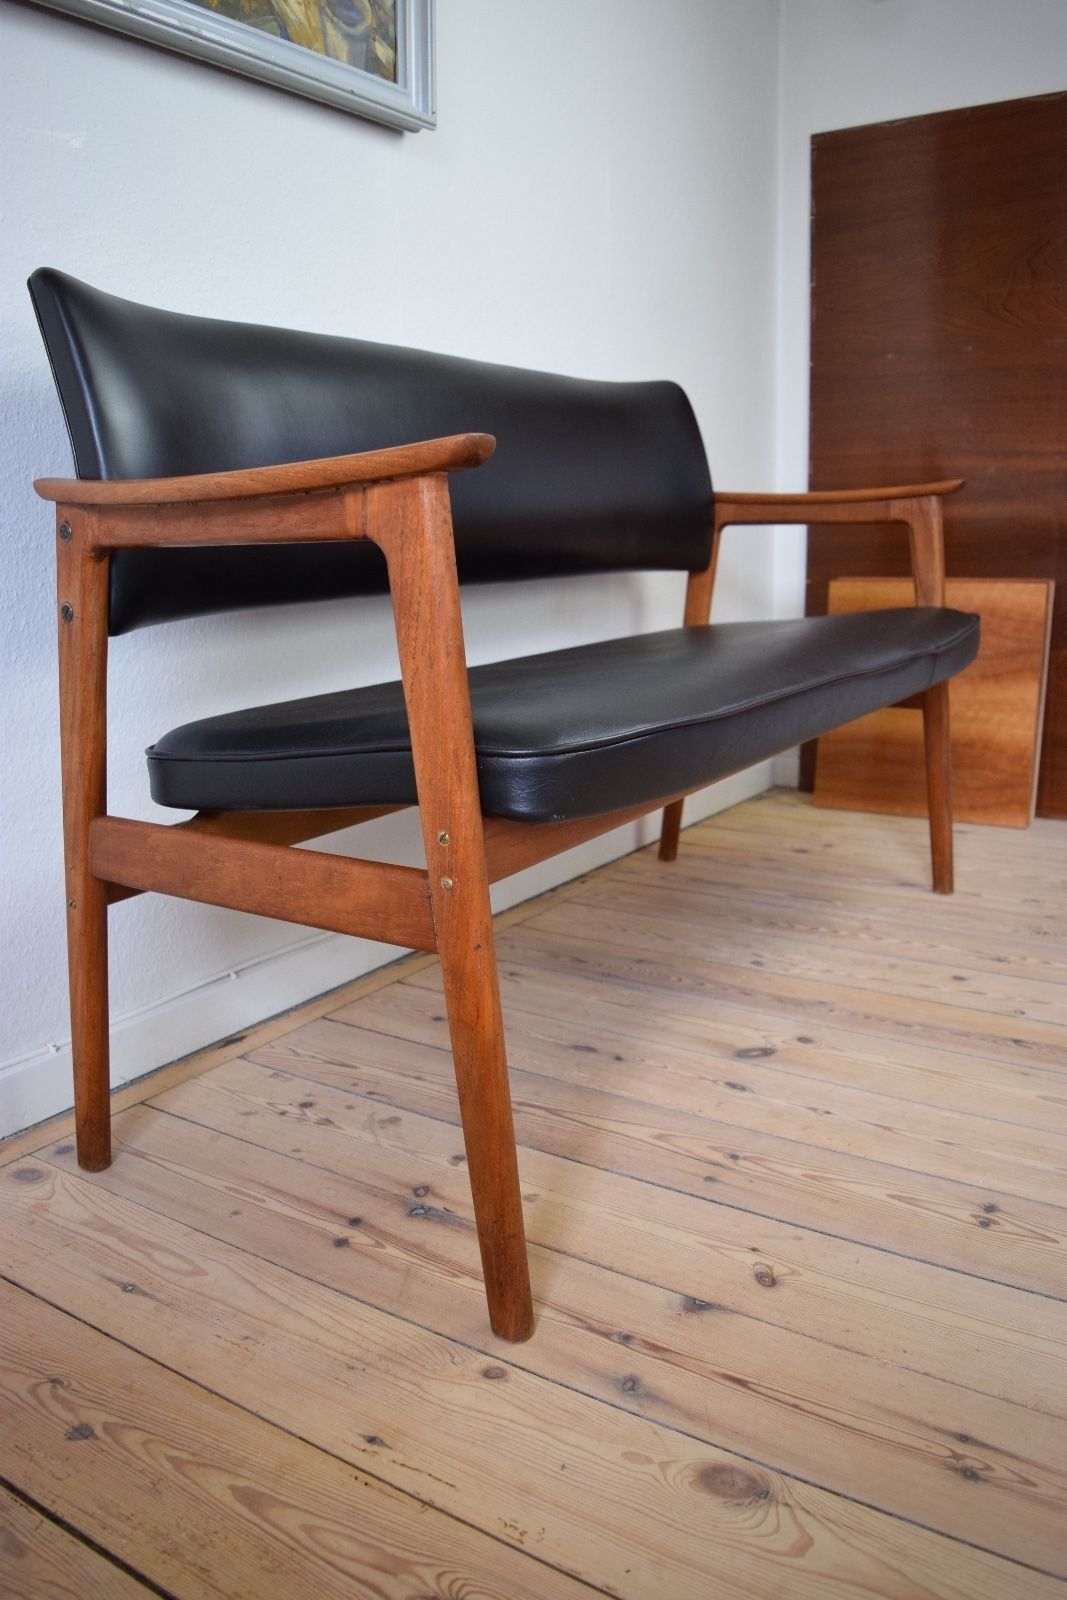 Image of: Danish Mid Century Teak Bench Seat Vinterior